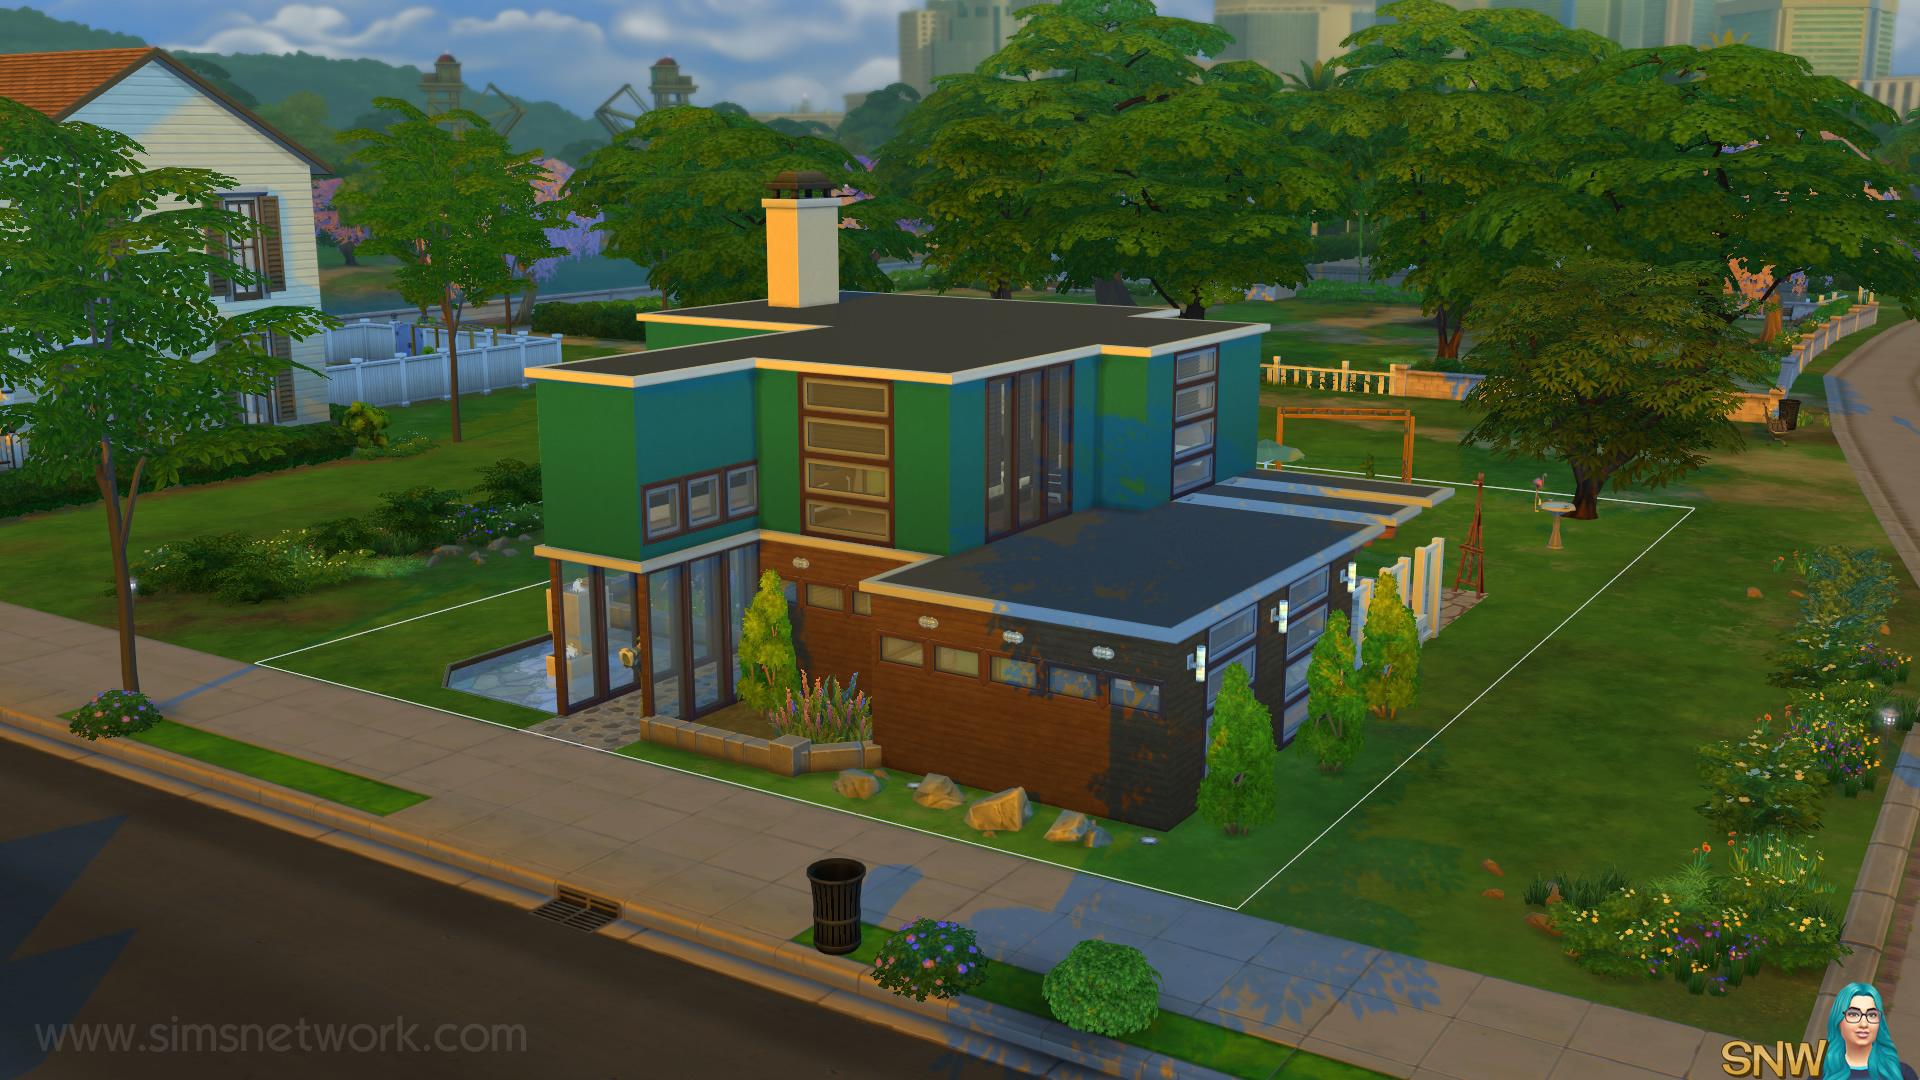 Mid Century Modern Huis In De Sims 4 Snw Simsnetwerk Com